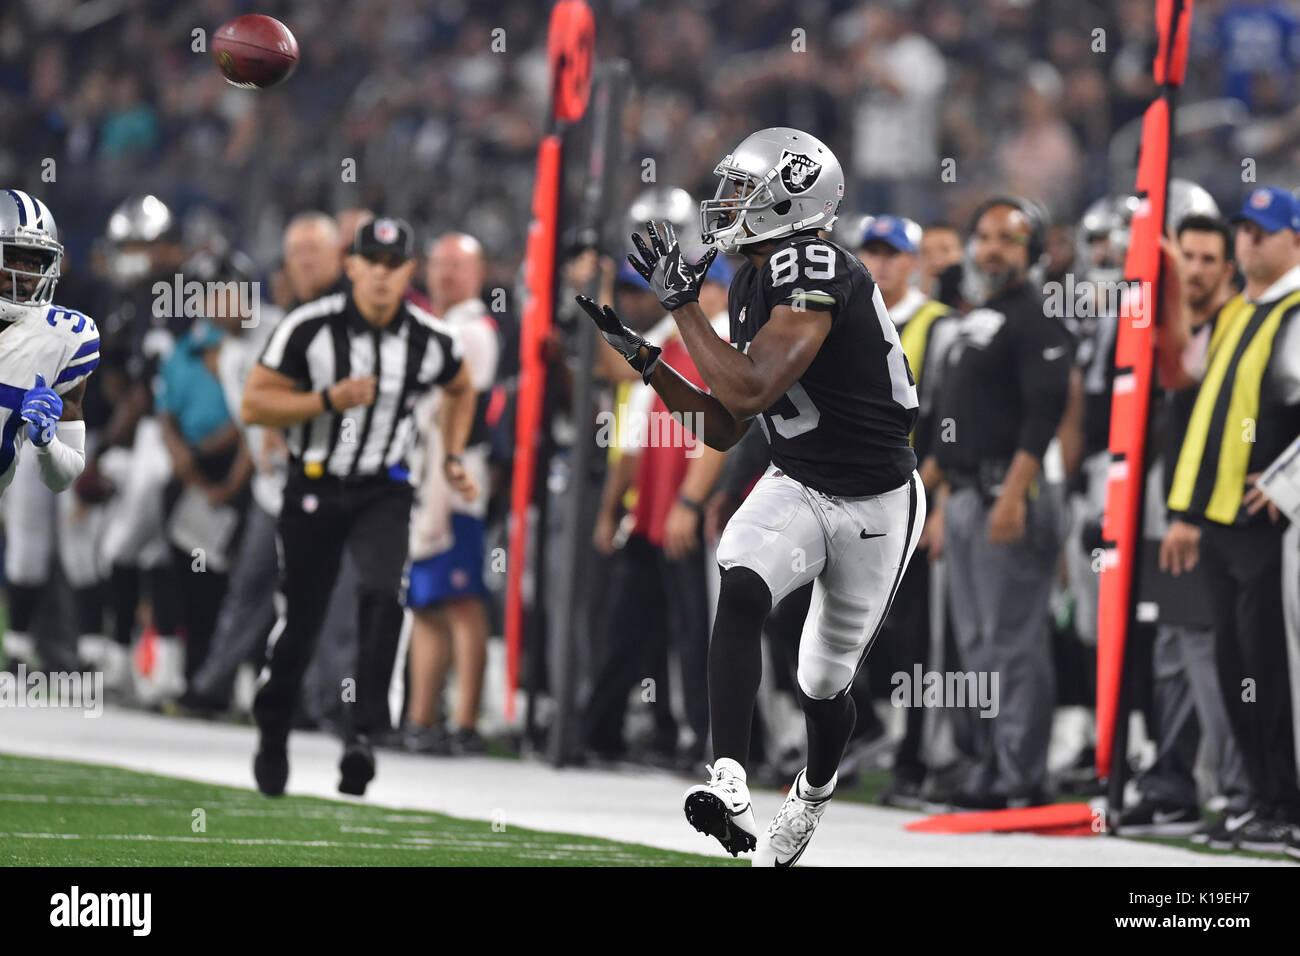 August 26 2017 Oakland Raiders wide receiver Amari Cooper 89